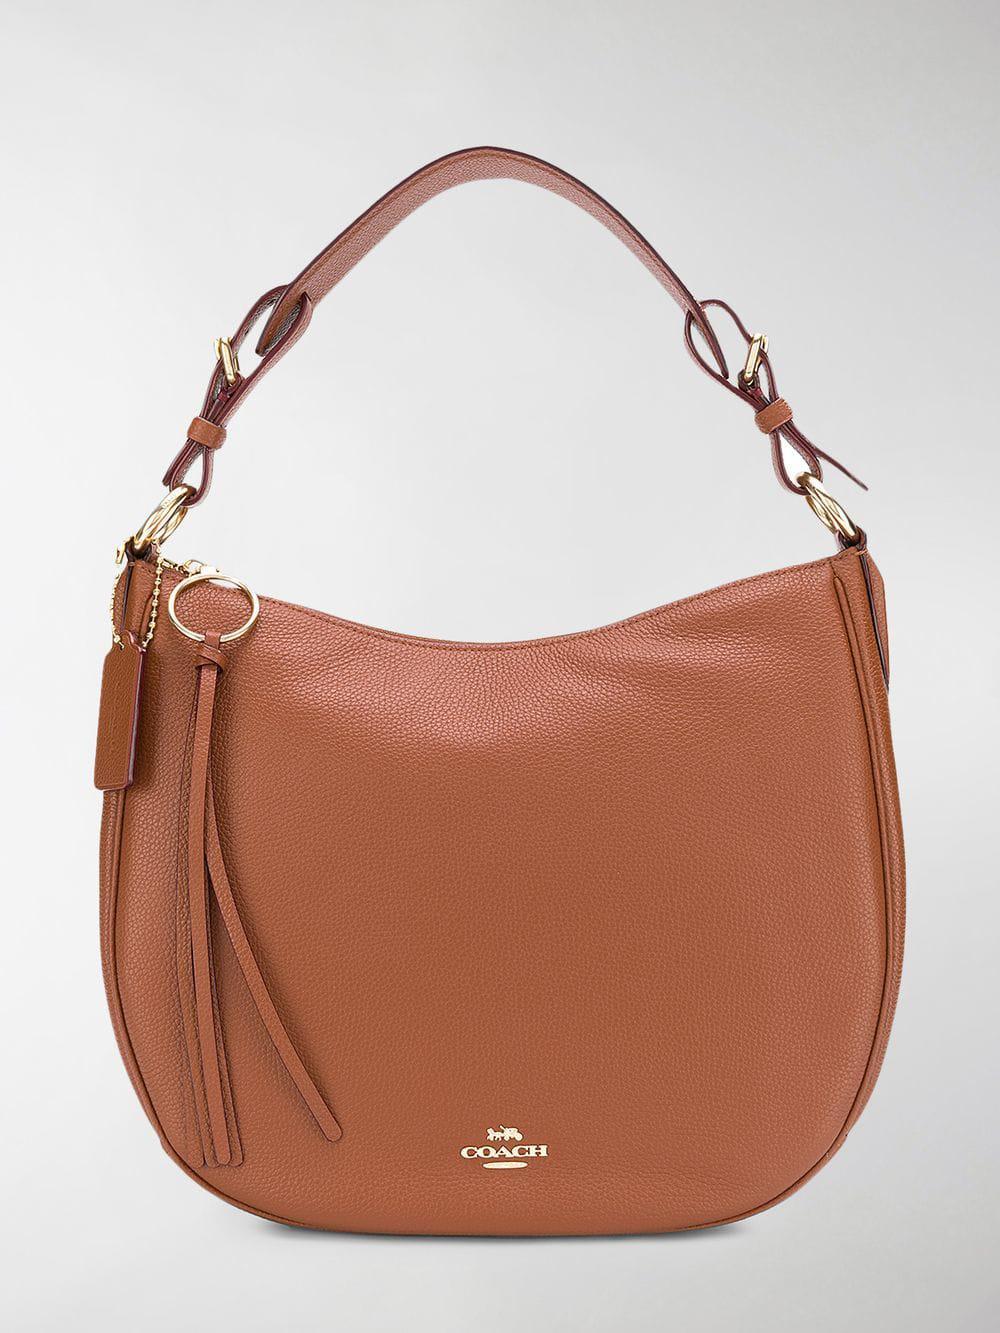 Coach brown sutton hobo bag view fullscreen jpg 1000x1333 Coach hobo  handbag green 8317a047fb